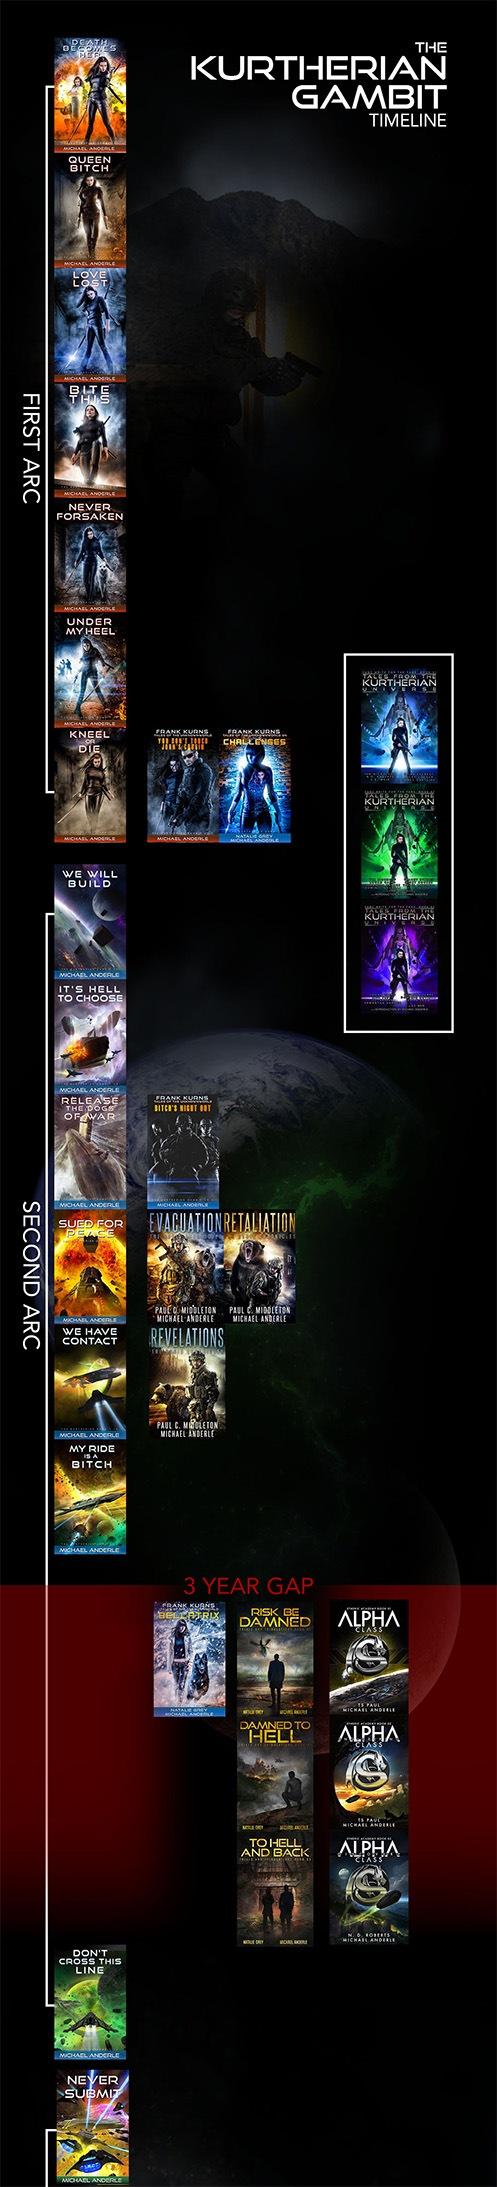 TKG New Timeline-1